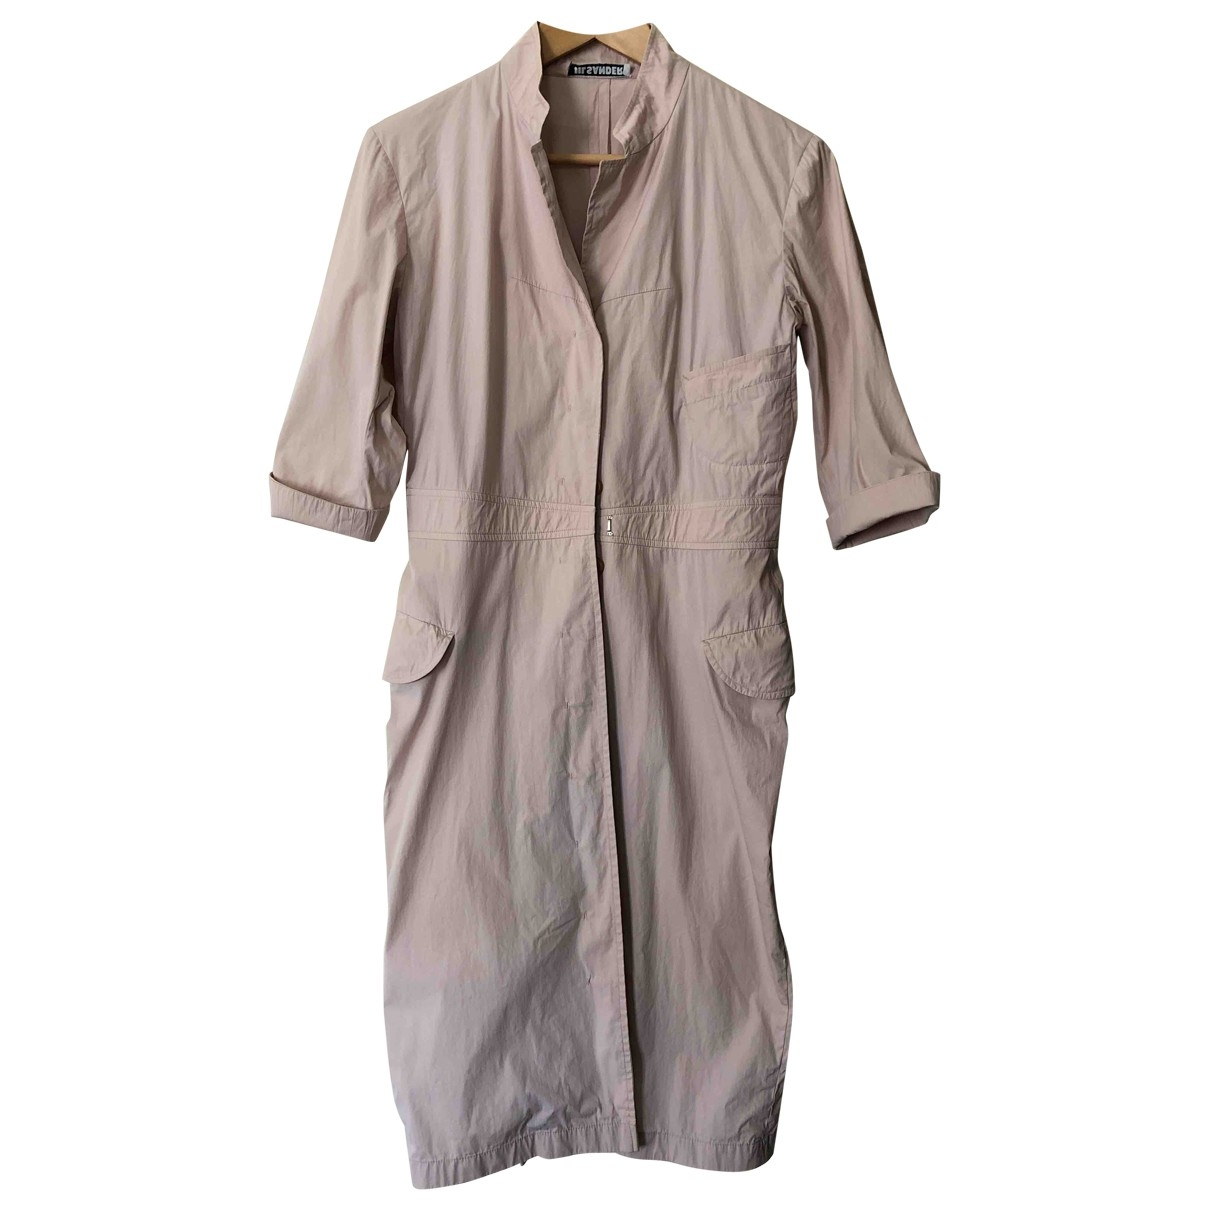 Jil Sander \N Pink Cotton dress for Women 40 FR